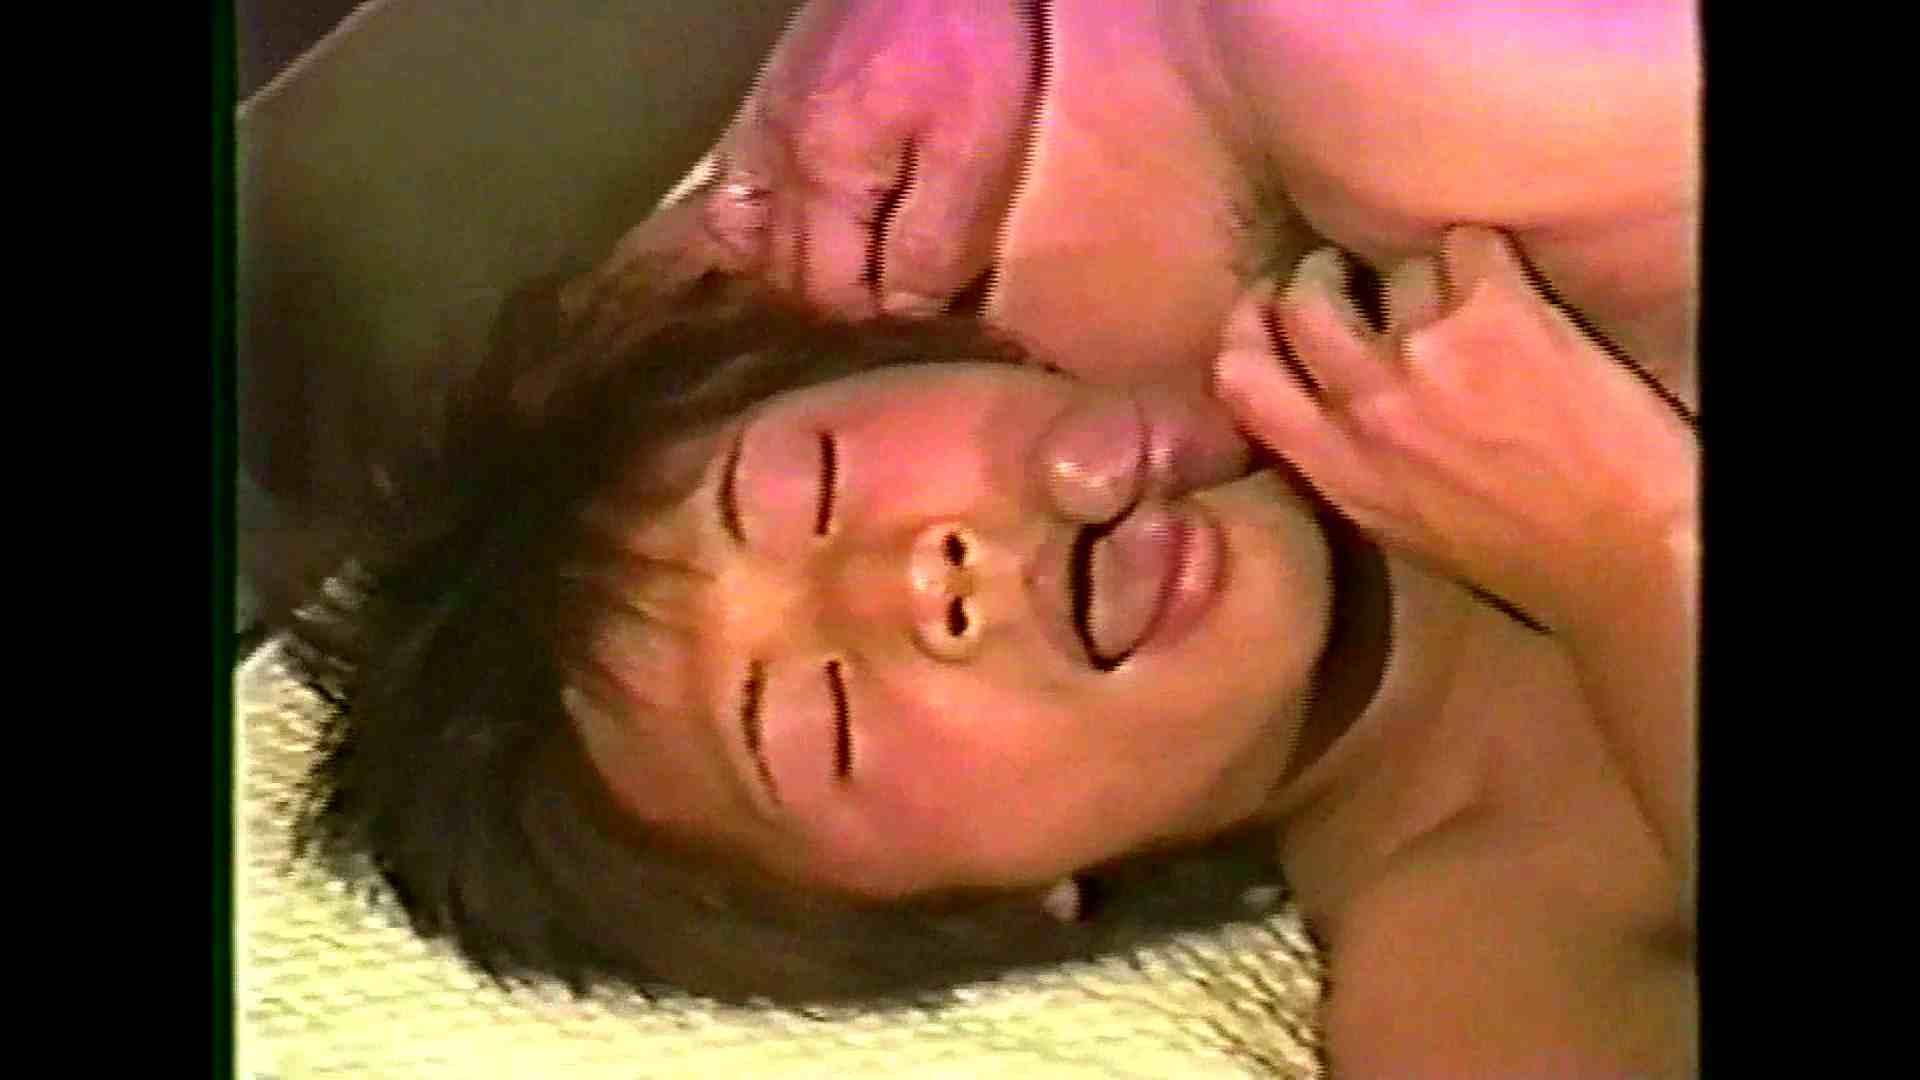 GAYBOY宏のオカズ倉庫Vol.3-2 ノンケ  95pic 18